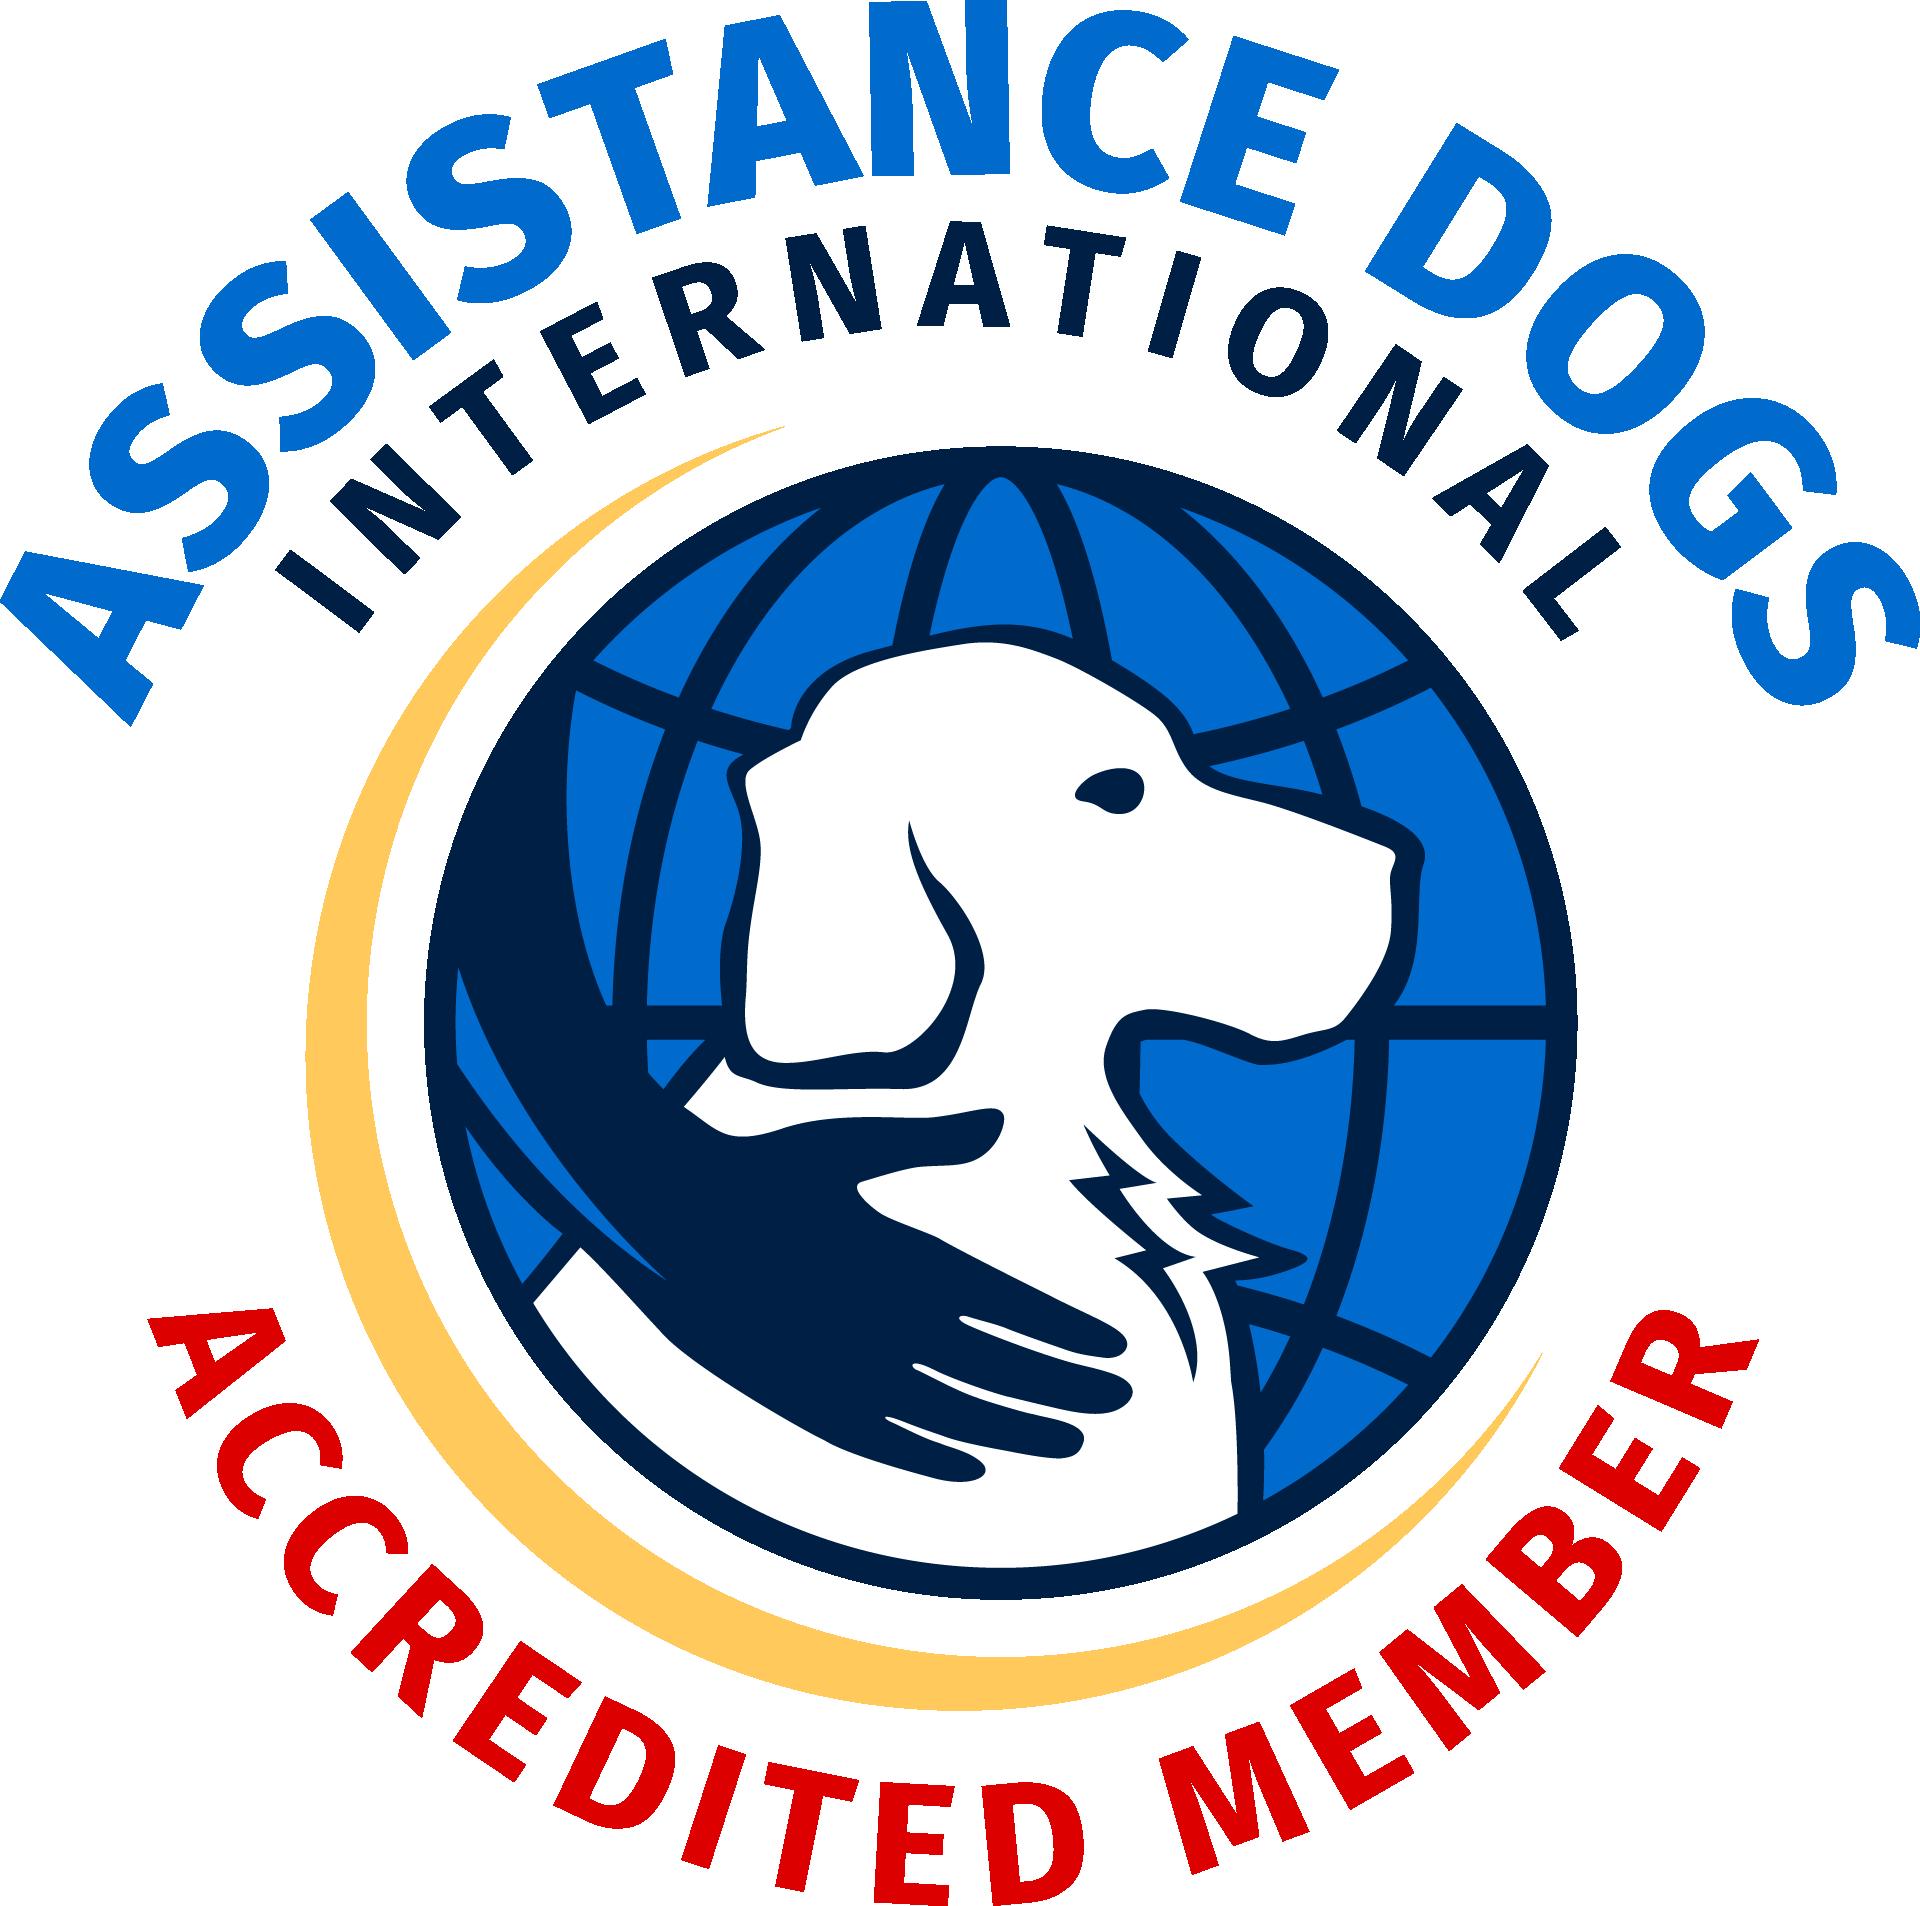 ADI-accredited-circle-logo